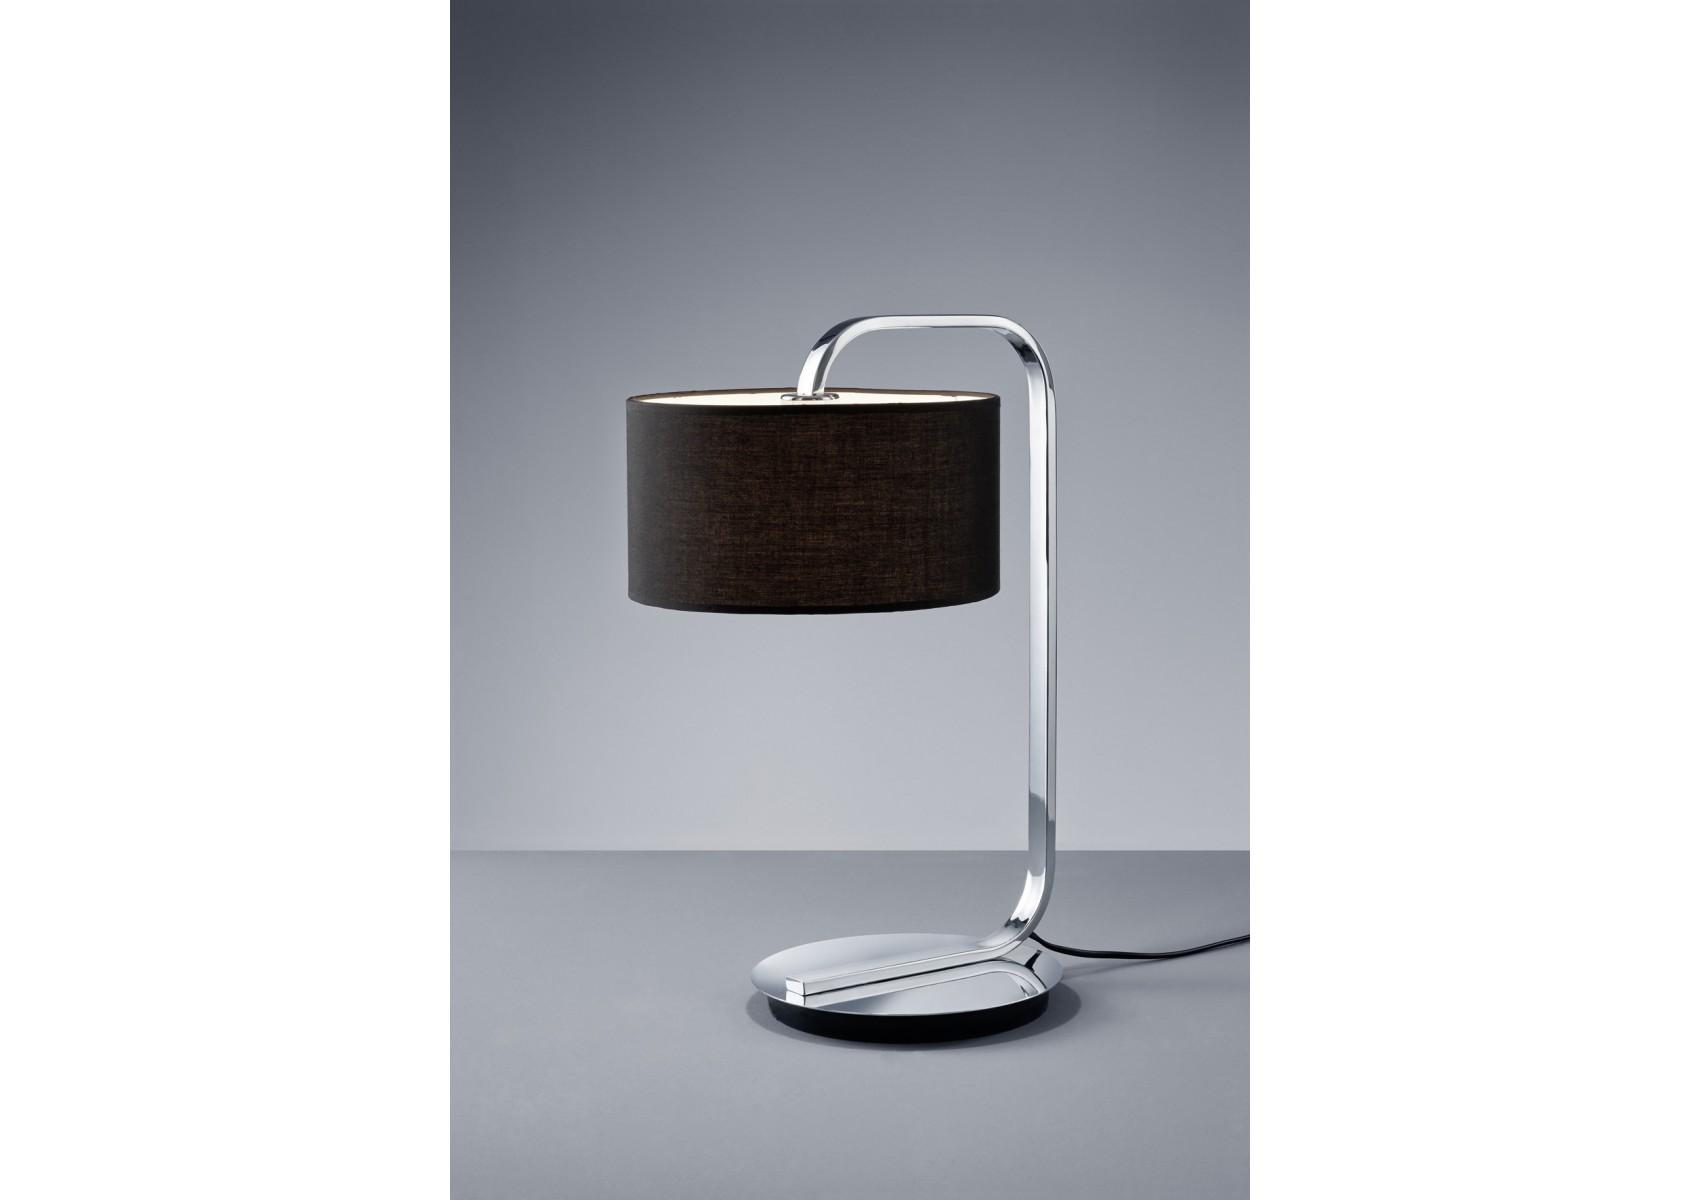 Lampe poser design cannes abat jour boite design - Lampes design a poser ...